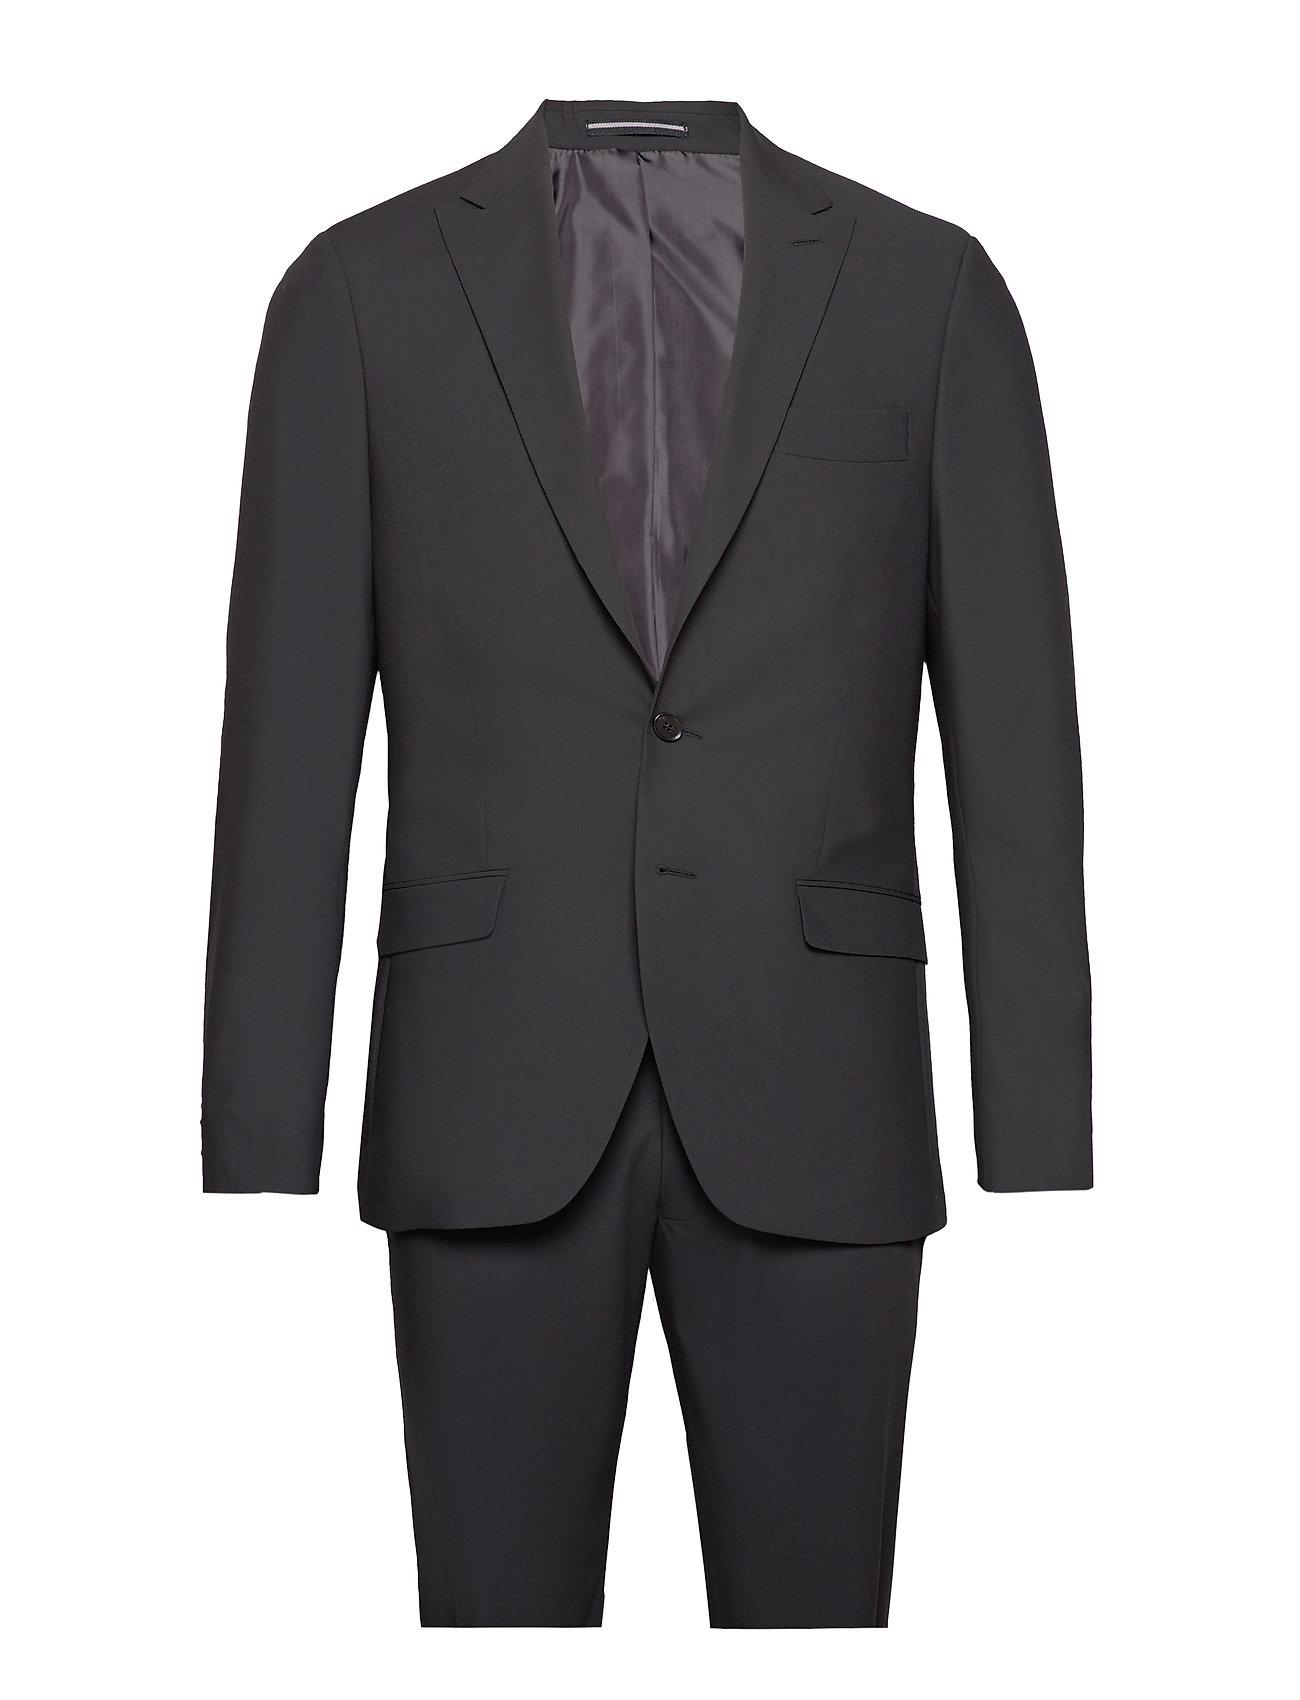 Bertoni Suit Drejer-Jepsen - 999 BLACK